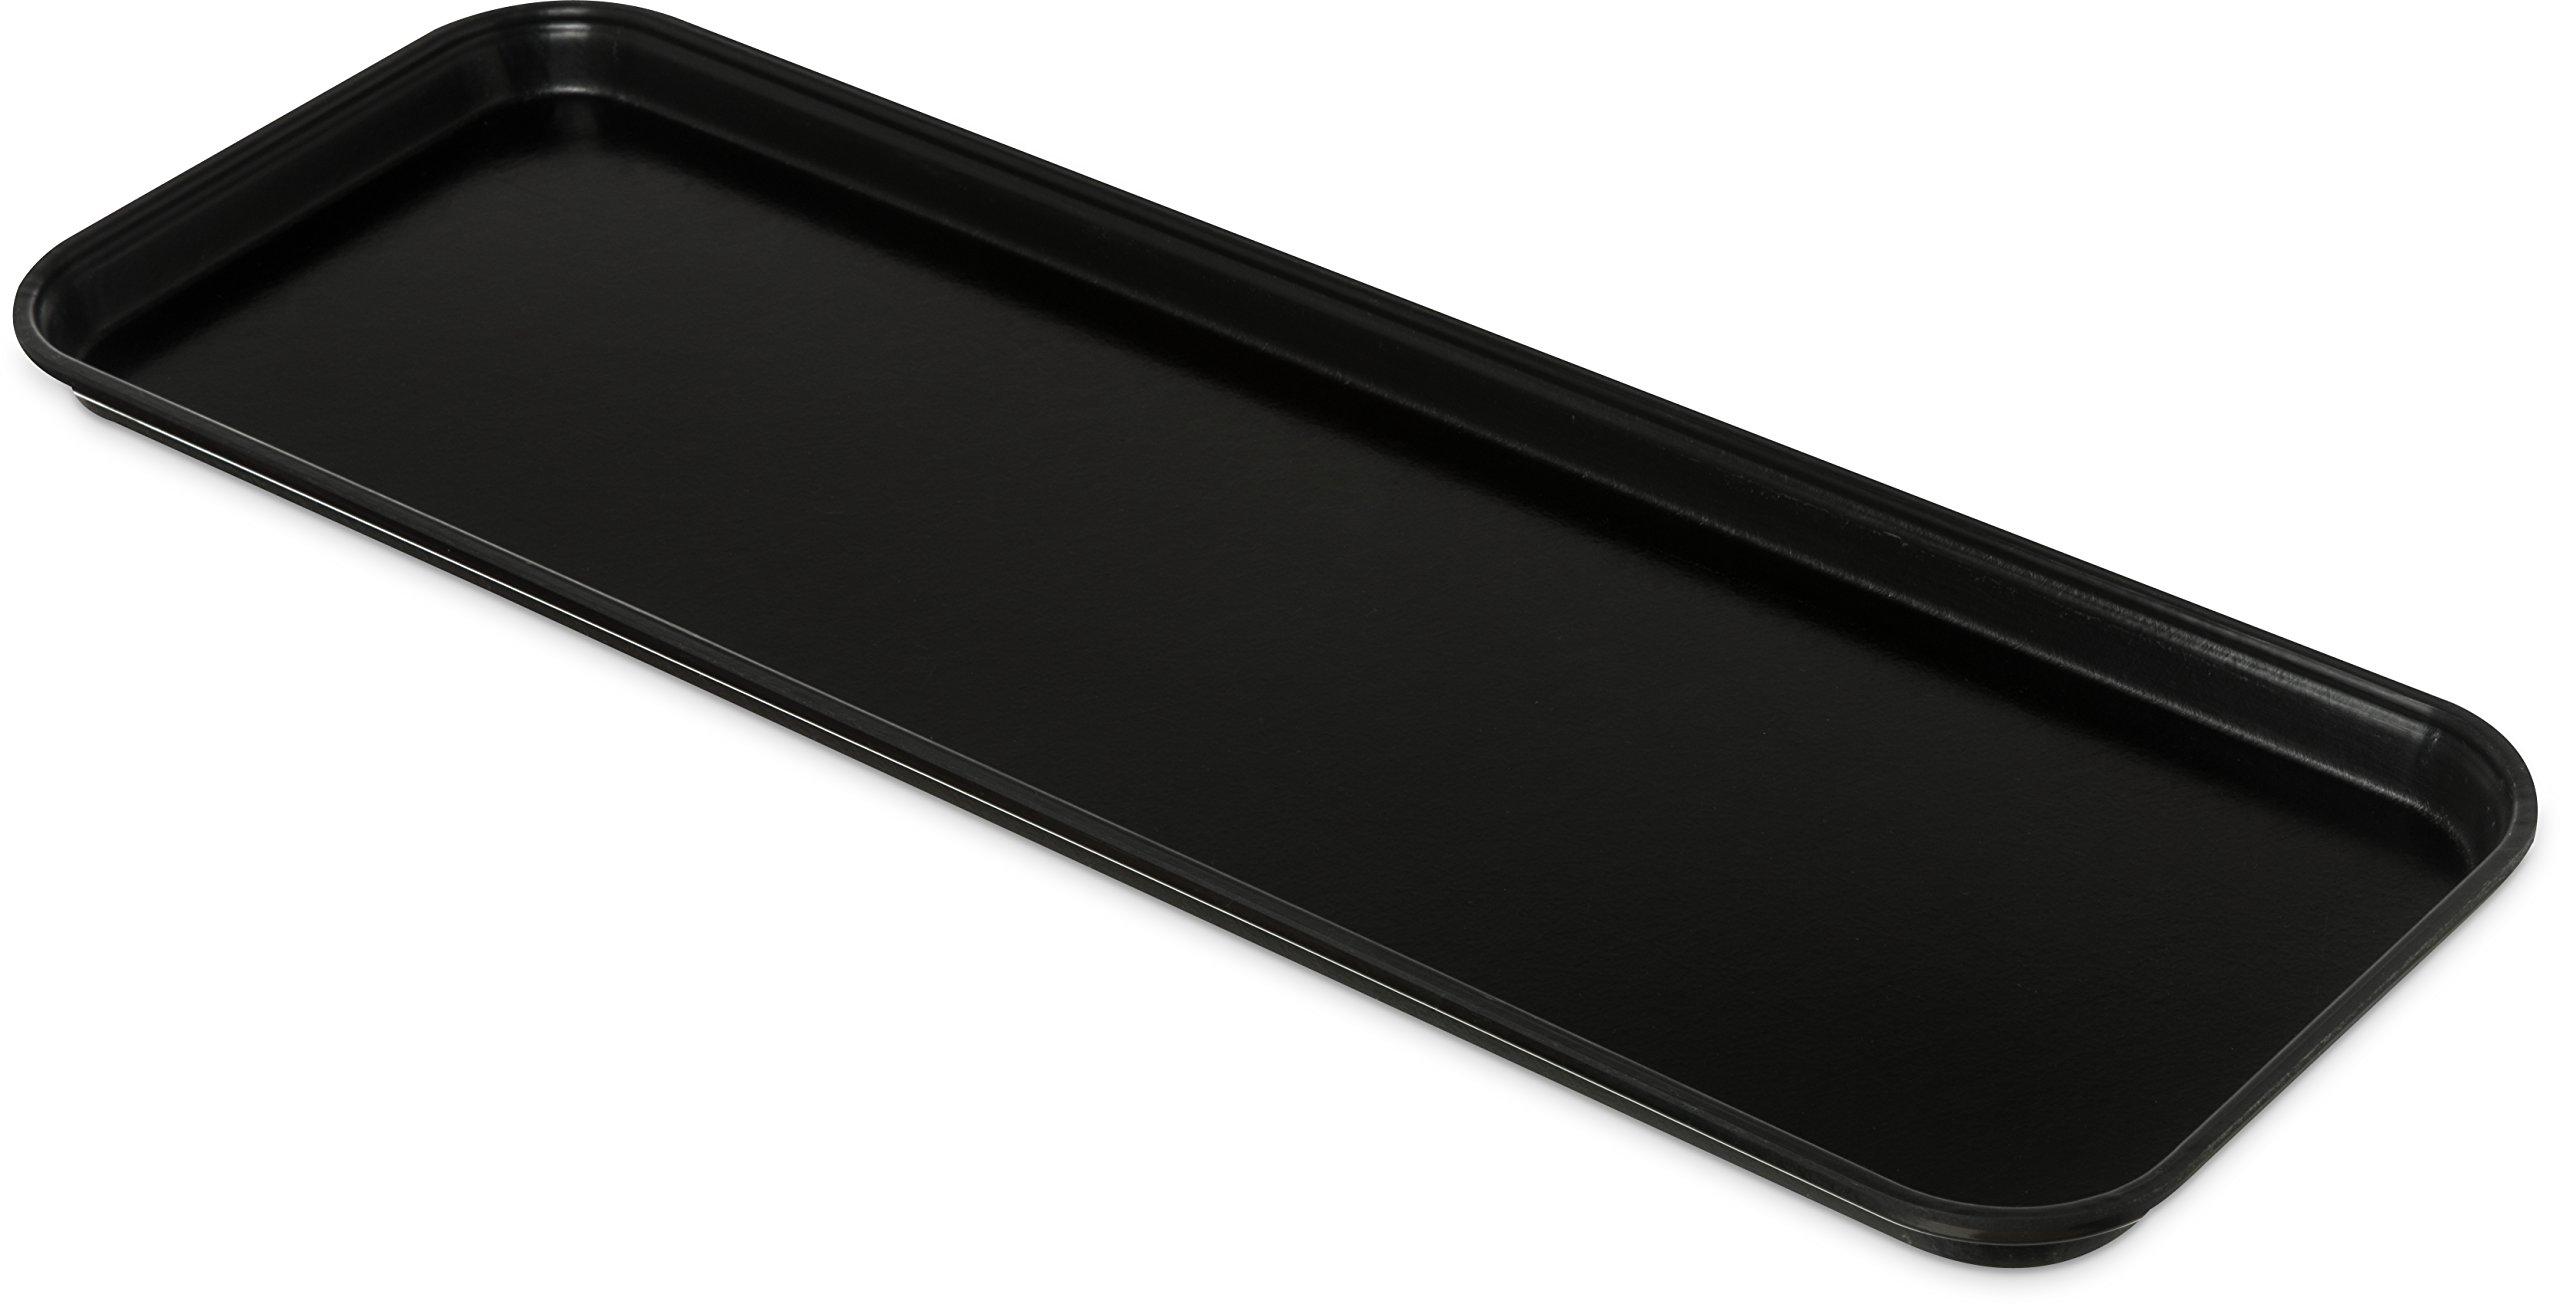 Carlisle 269FMT309 Food Service Display Tray, 9'' x 26'', Black (Pack of 12)